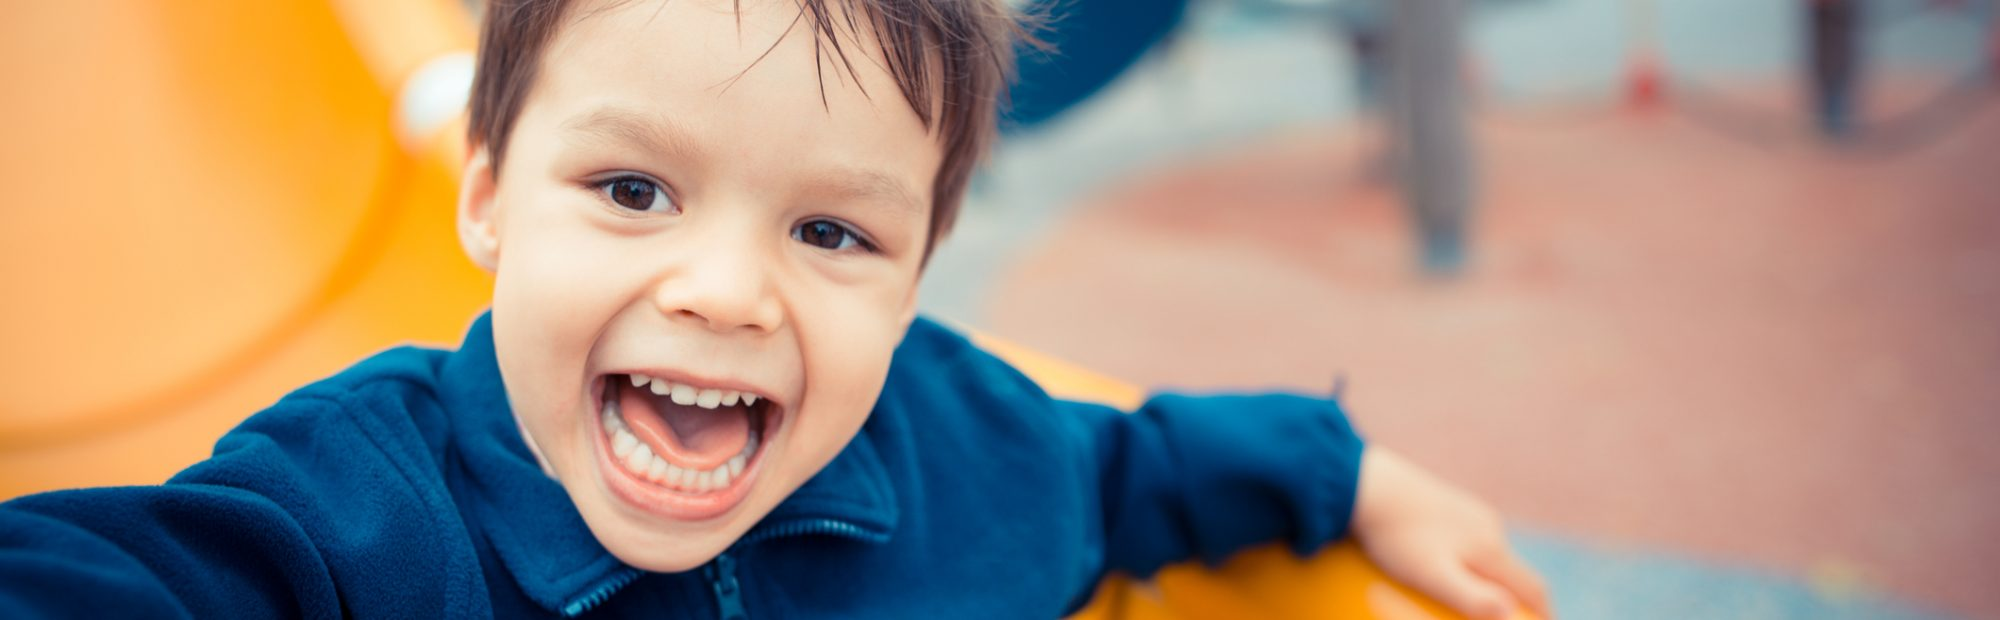 Cute little boy playing on slide